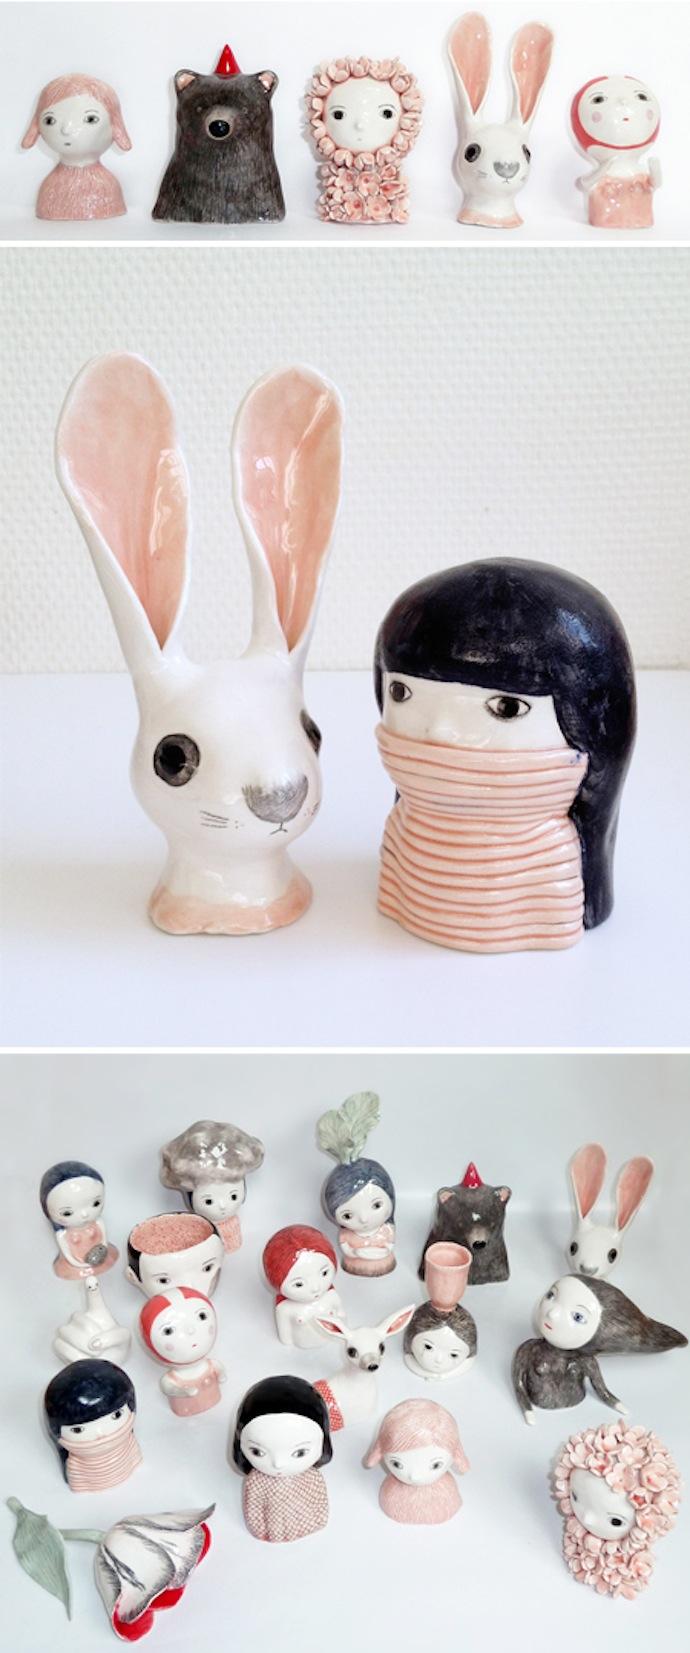 nathalie_choux_ceramics_animals_cute_1